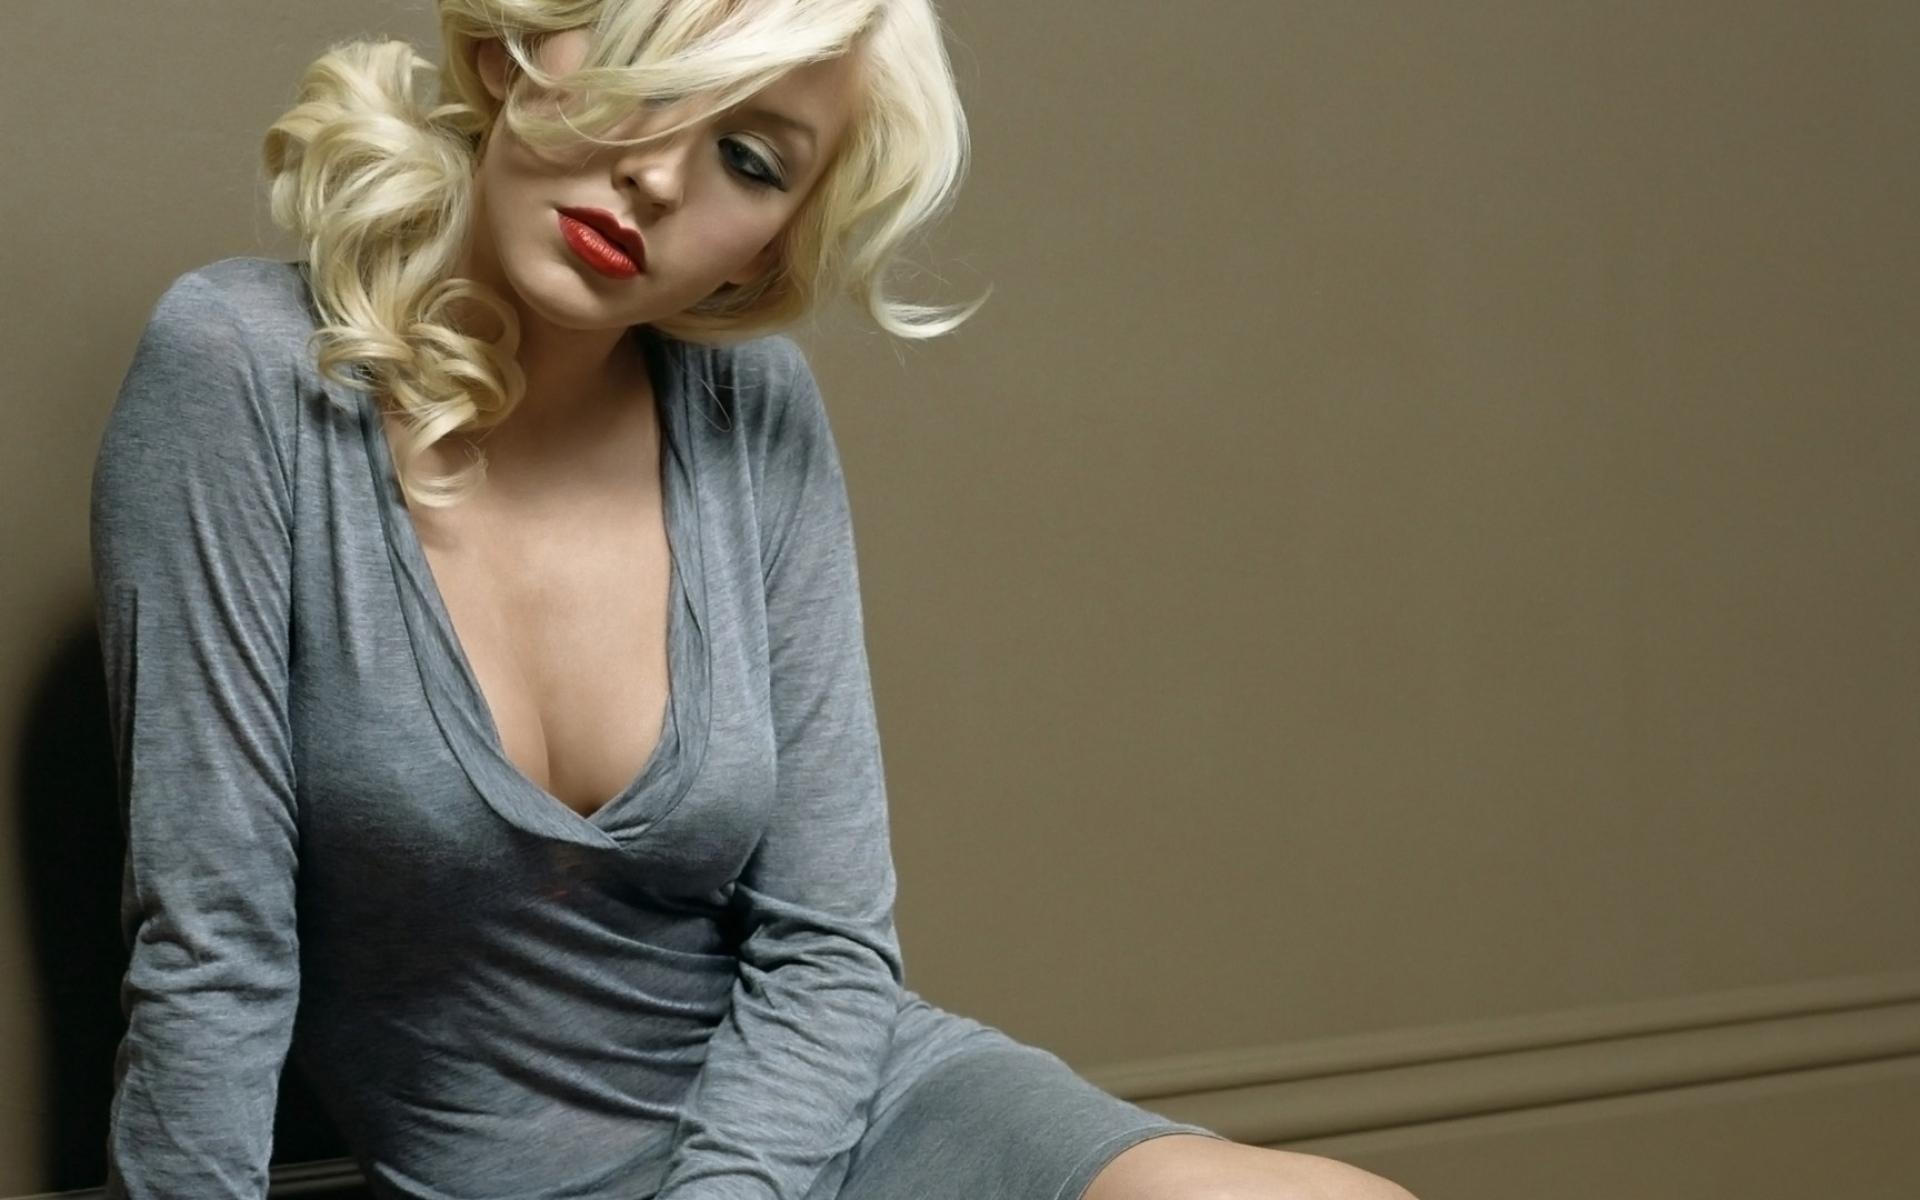 Картинки Christina aguilera, сундук, одежда, пол, блондинка фото и обои на рабочий стол